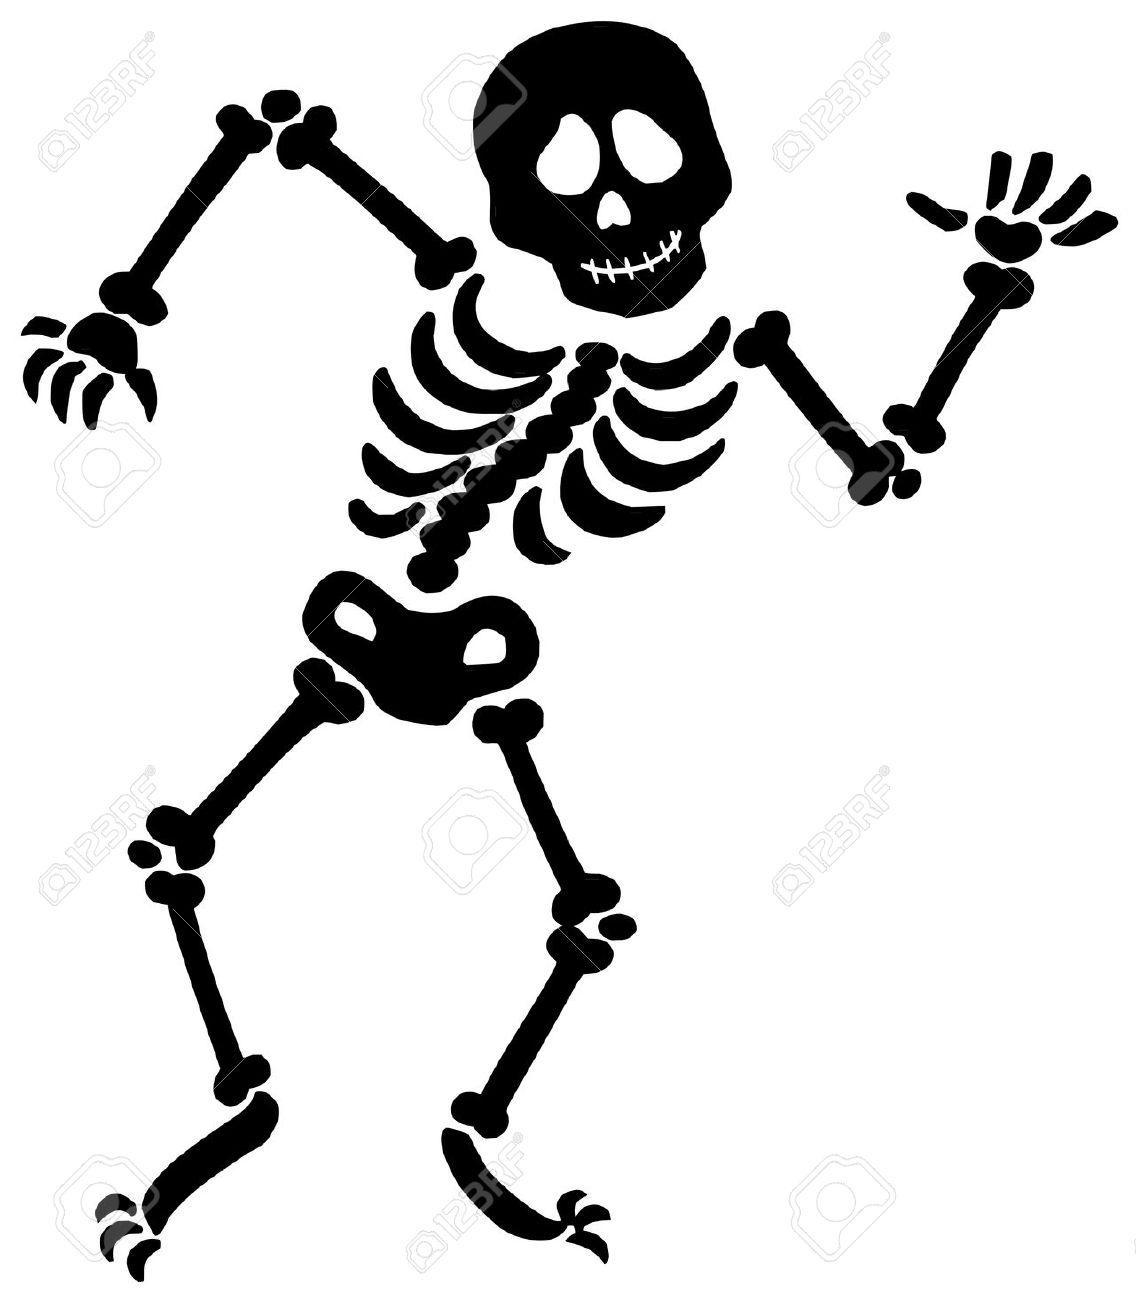 Skeleton Bones Clipart #1. Dancing skeleton silhouette .